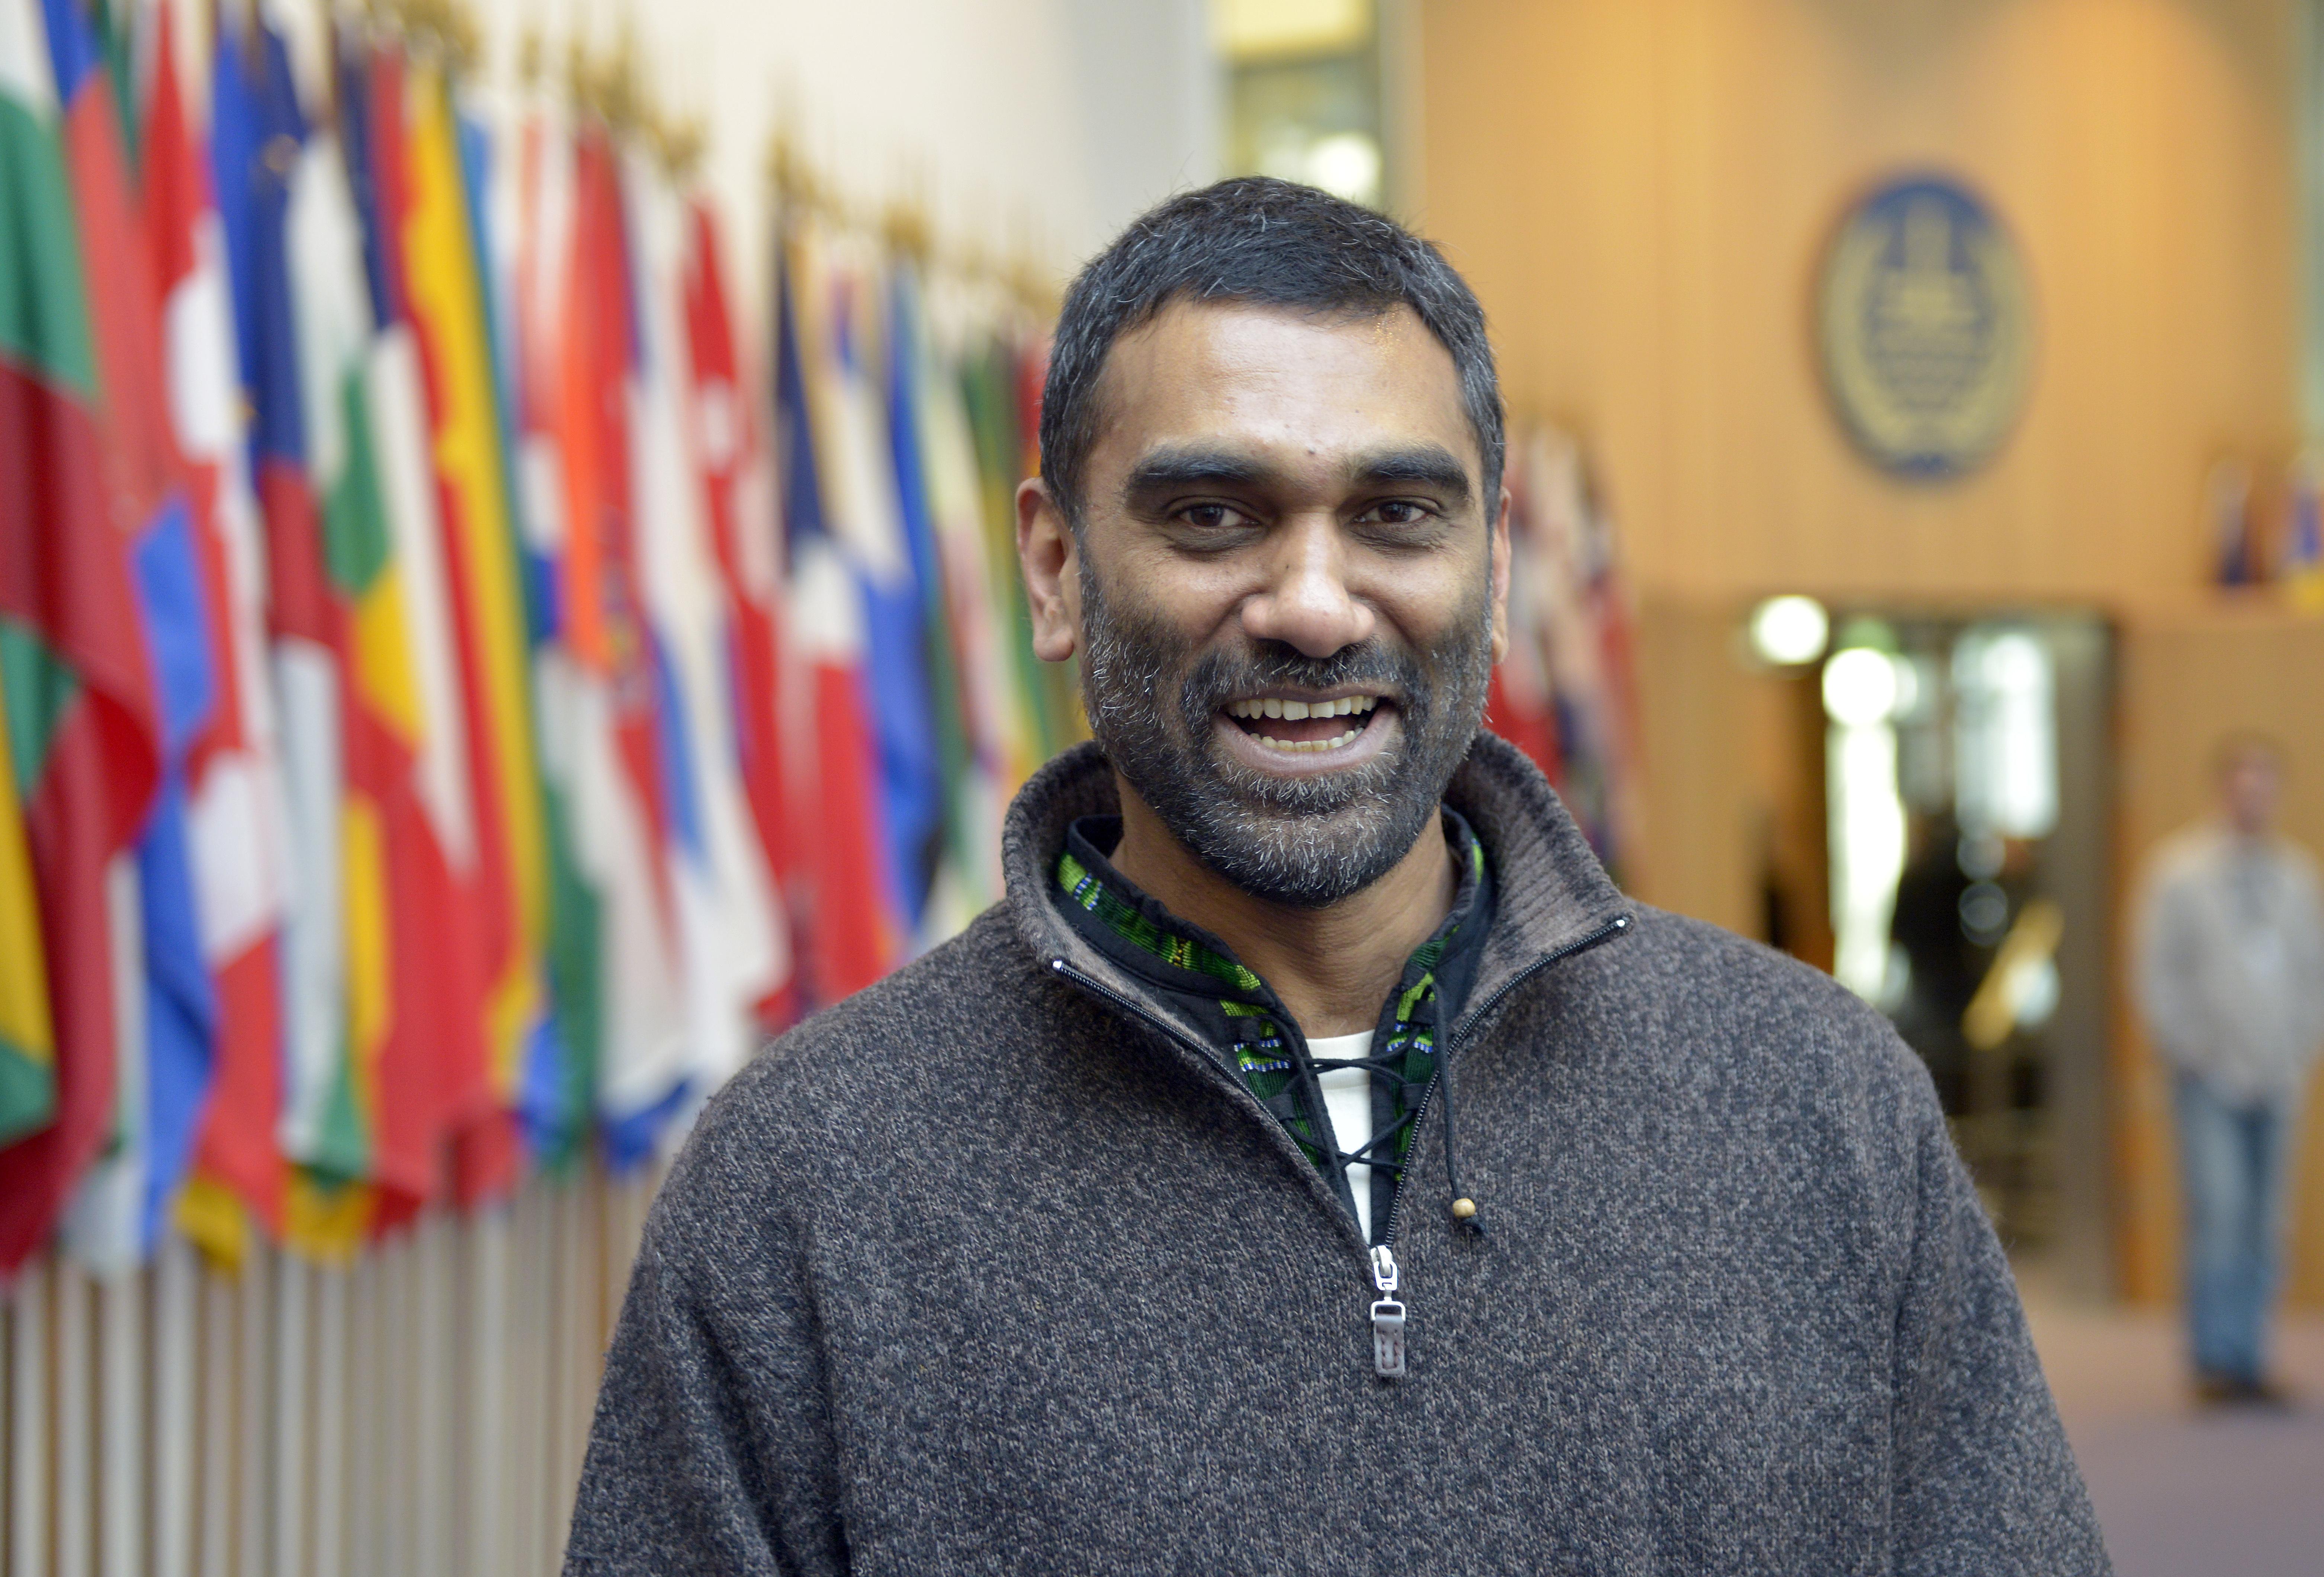 Kumi Naidoo, secrétaire générale d'Amnesty International